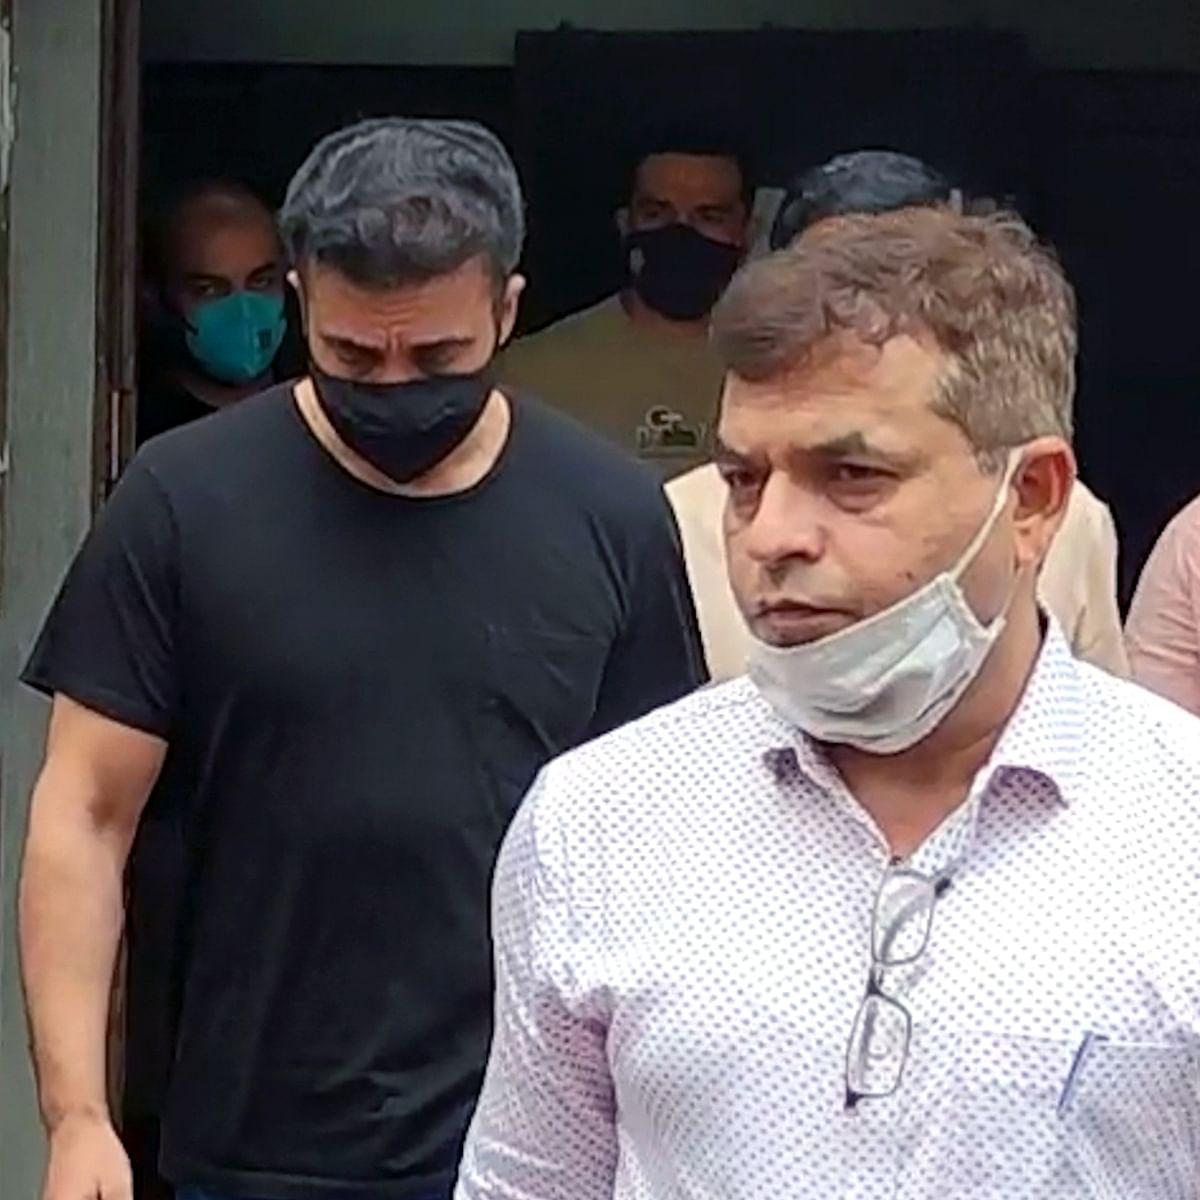 FPJ Legal: Bombay HC reserves order on Raj Kundra's plea against arrest in porn films case